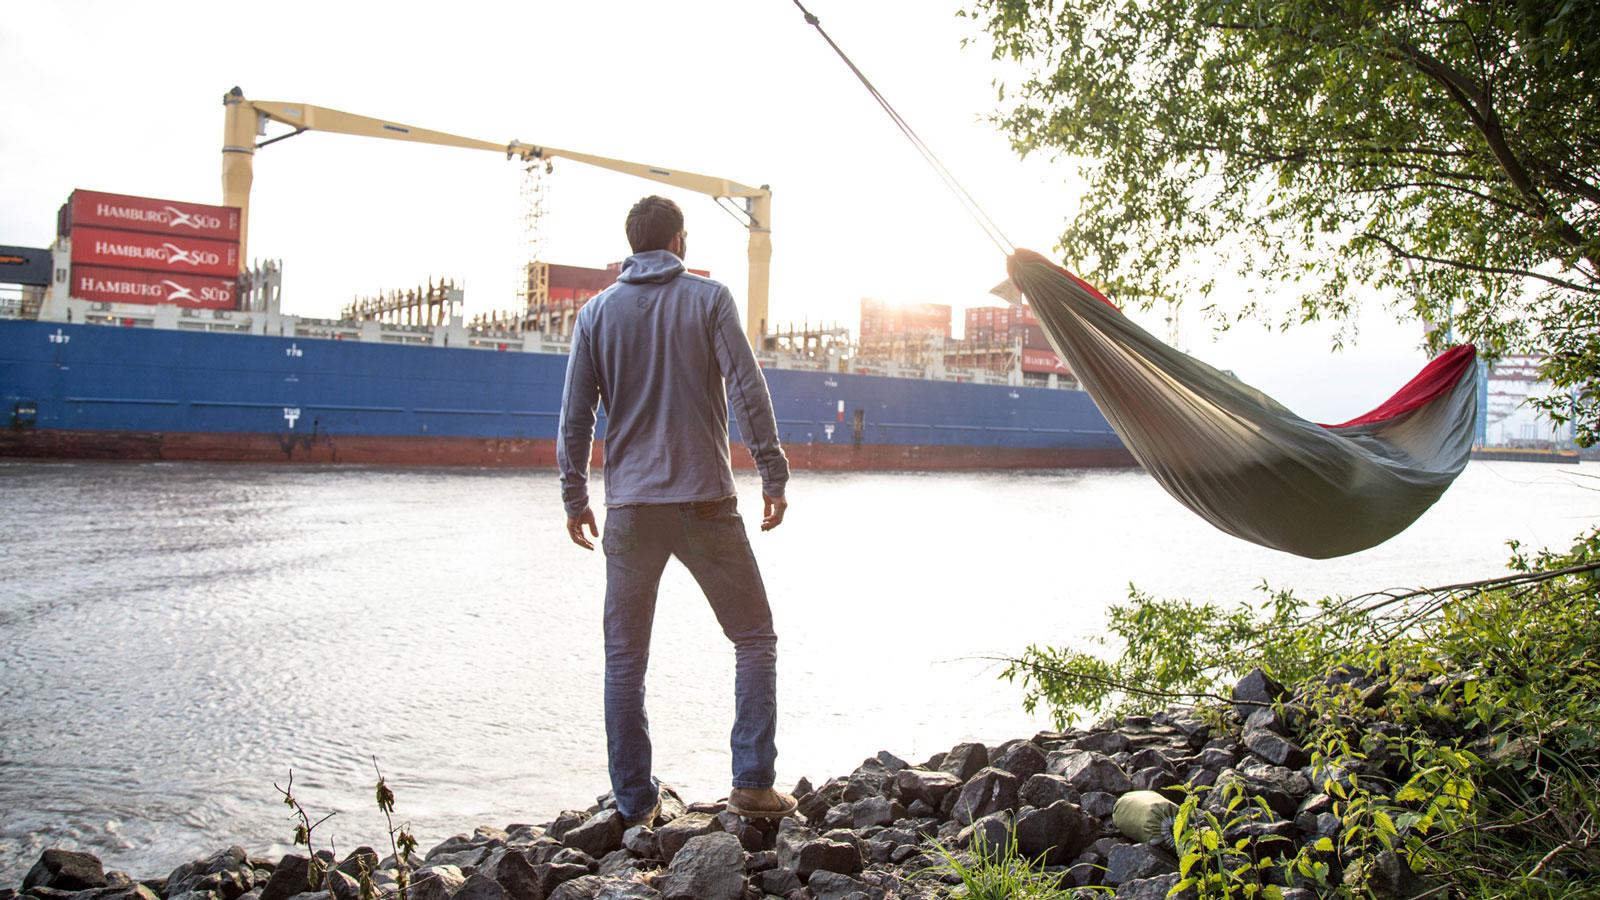 Mikroabenteuer: Christo Foerster am Hamburger Hafen